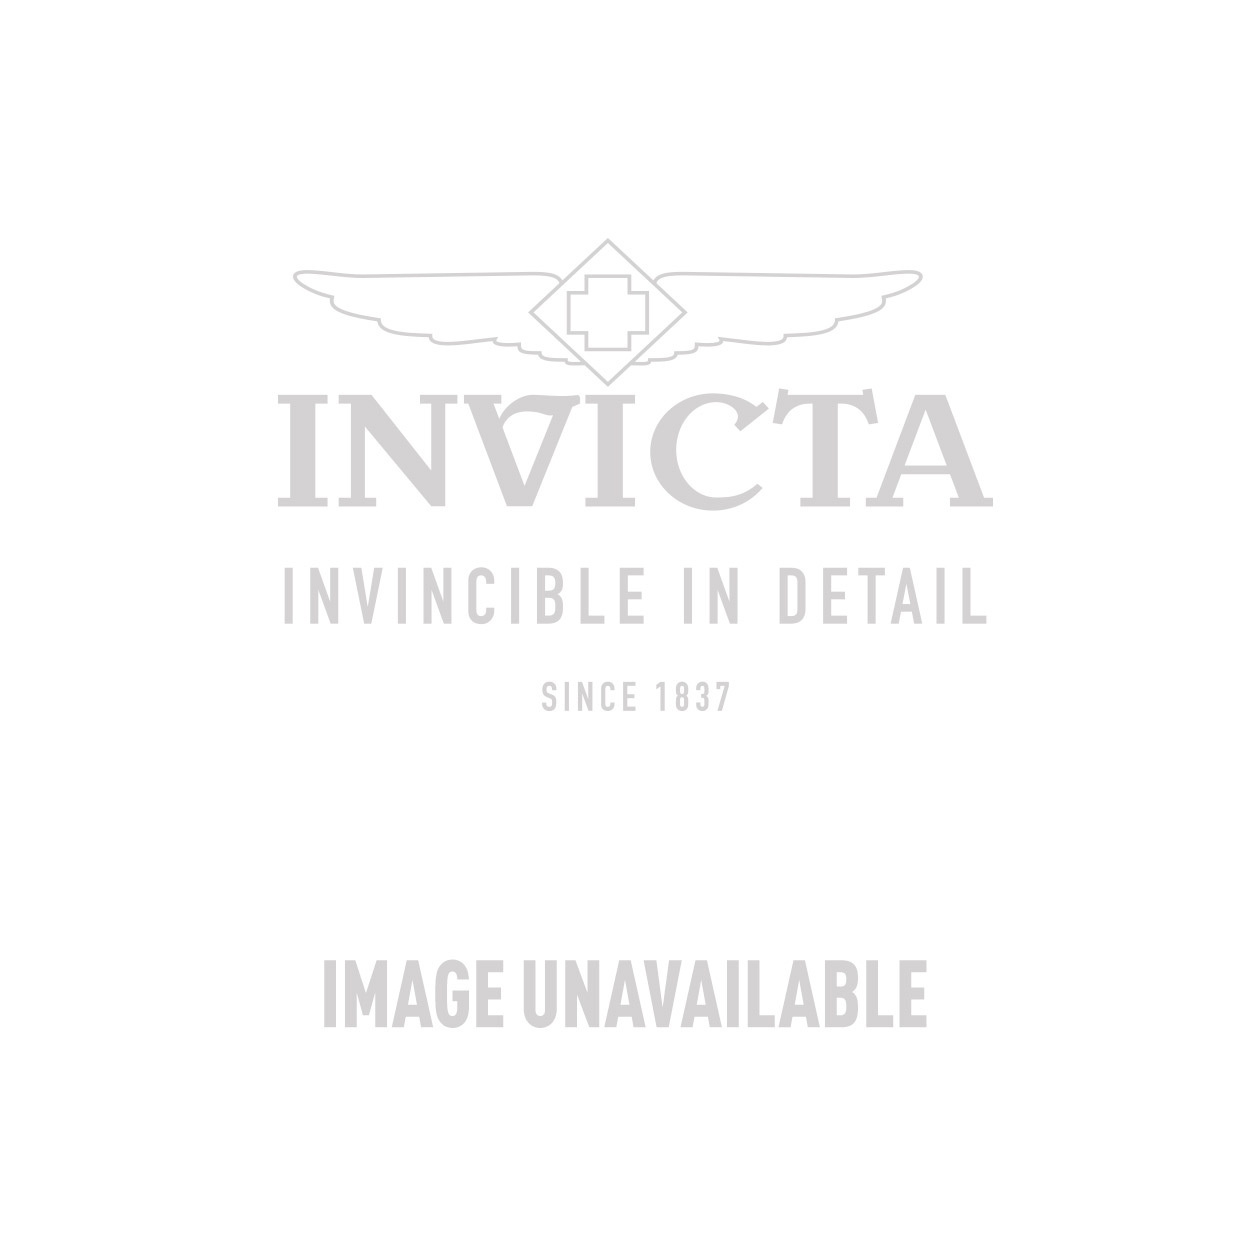 Invicta Sea Hunter  Quartz Watch - Stainless Steel case with Black tone Polyurethane band - Model 1983